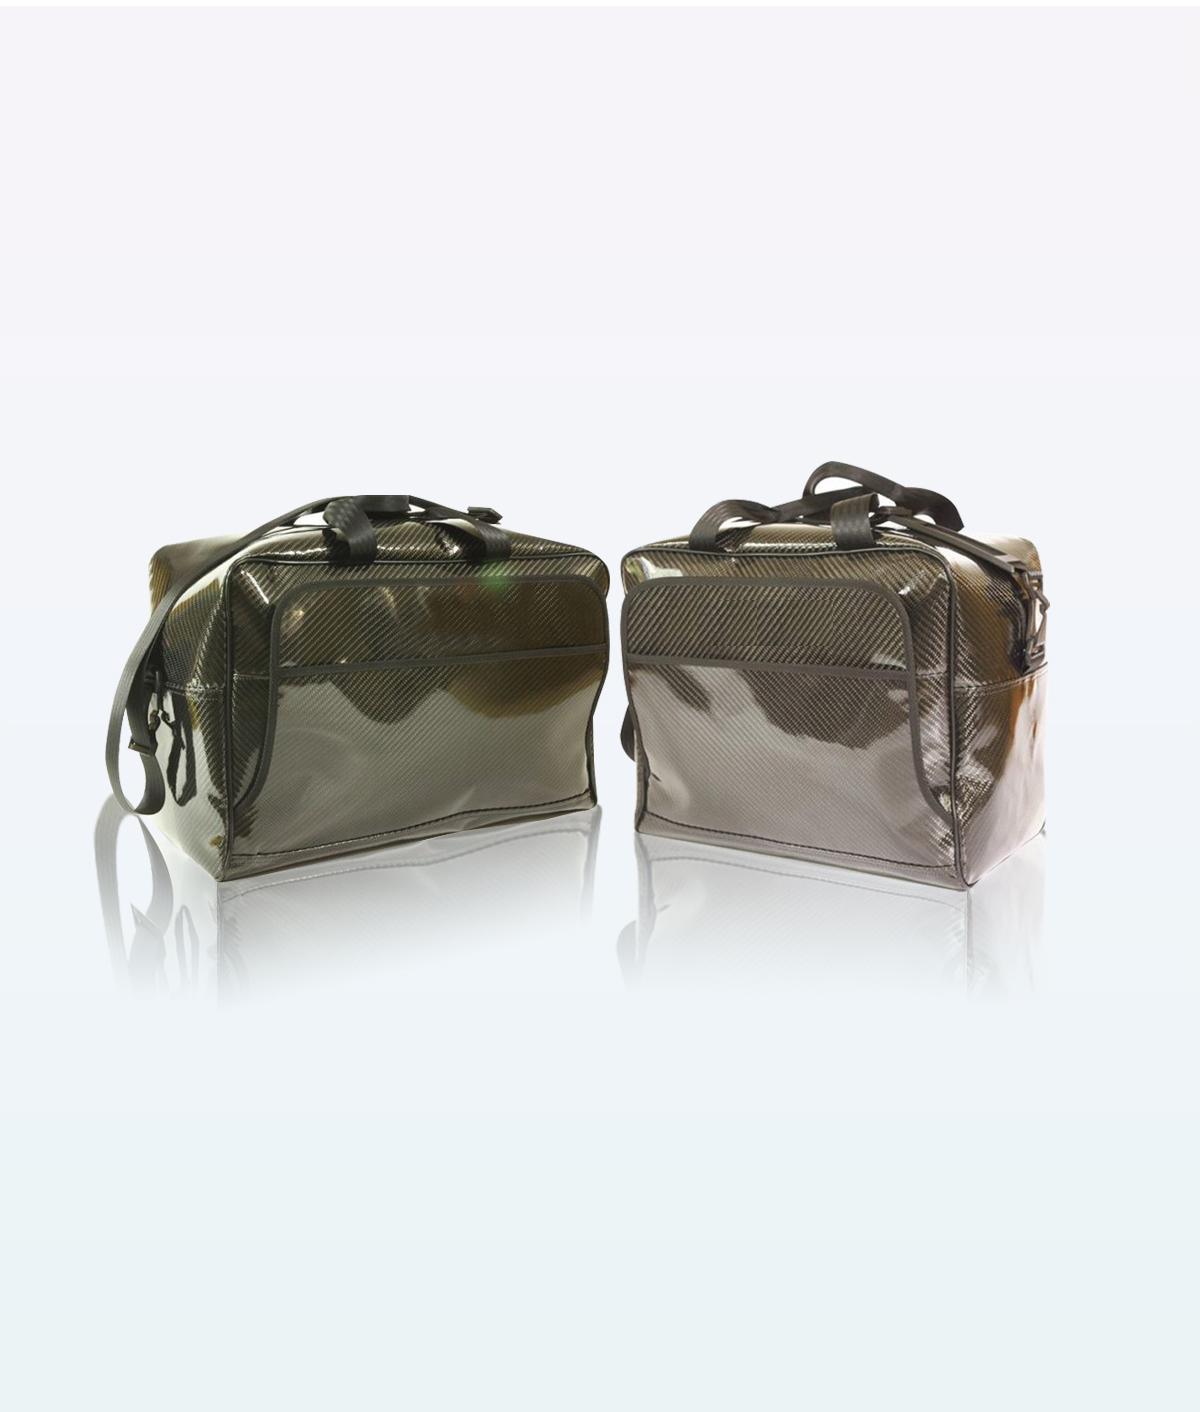 carbon-travel-bag